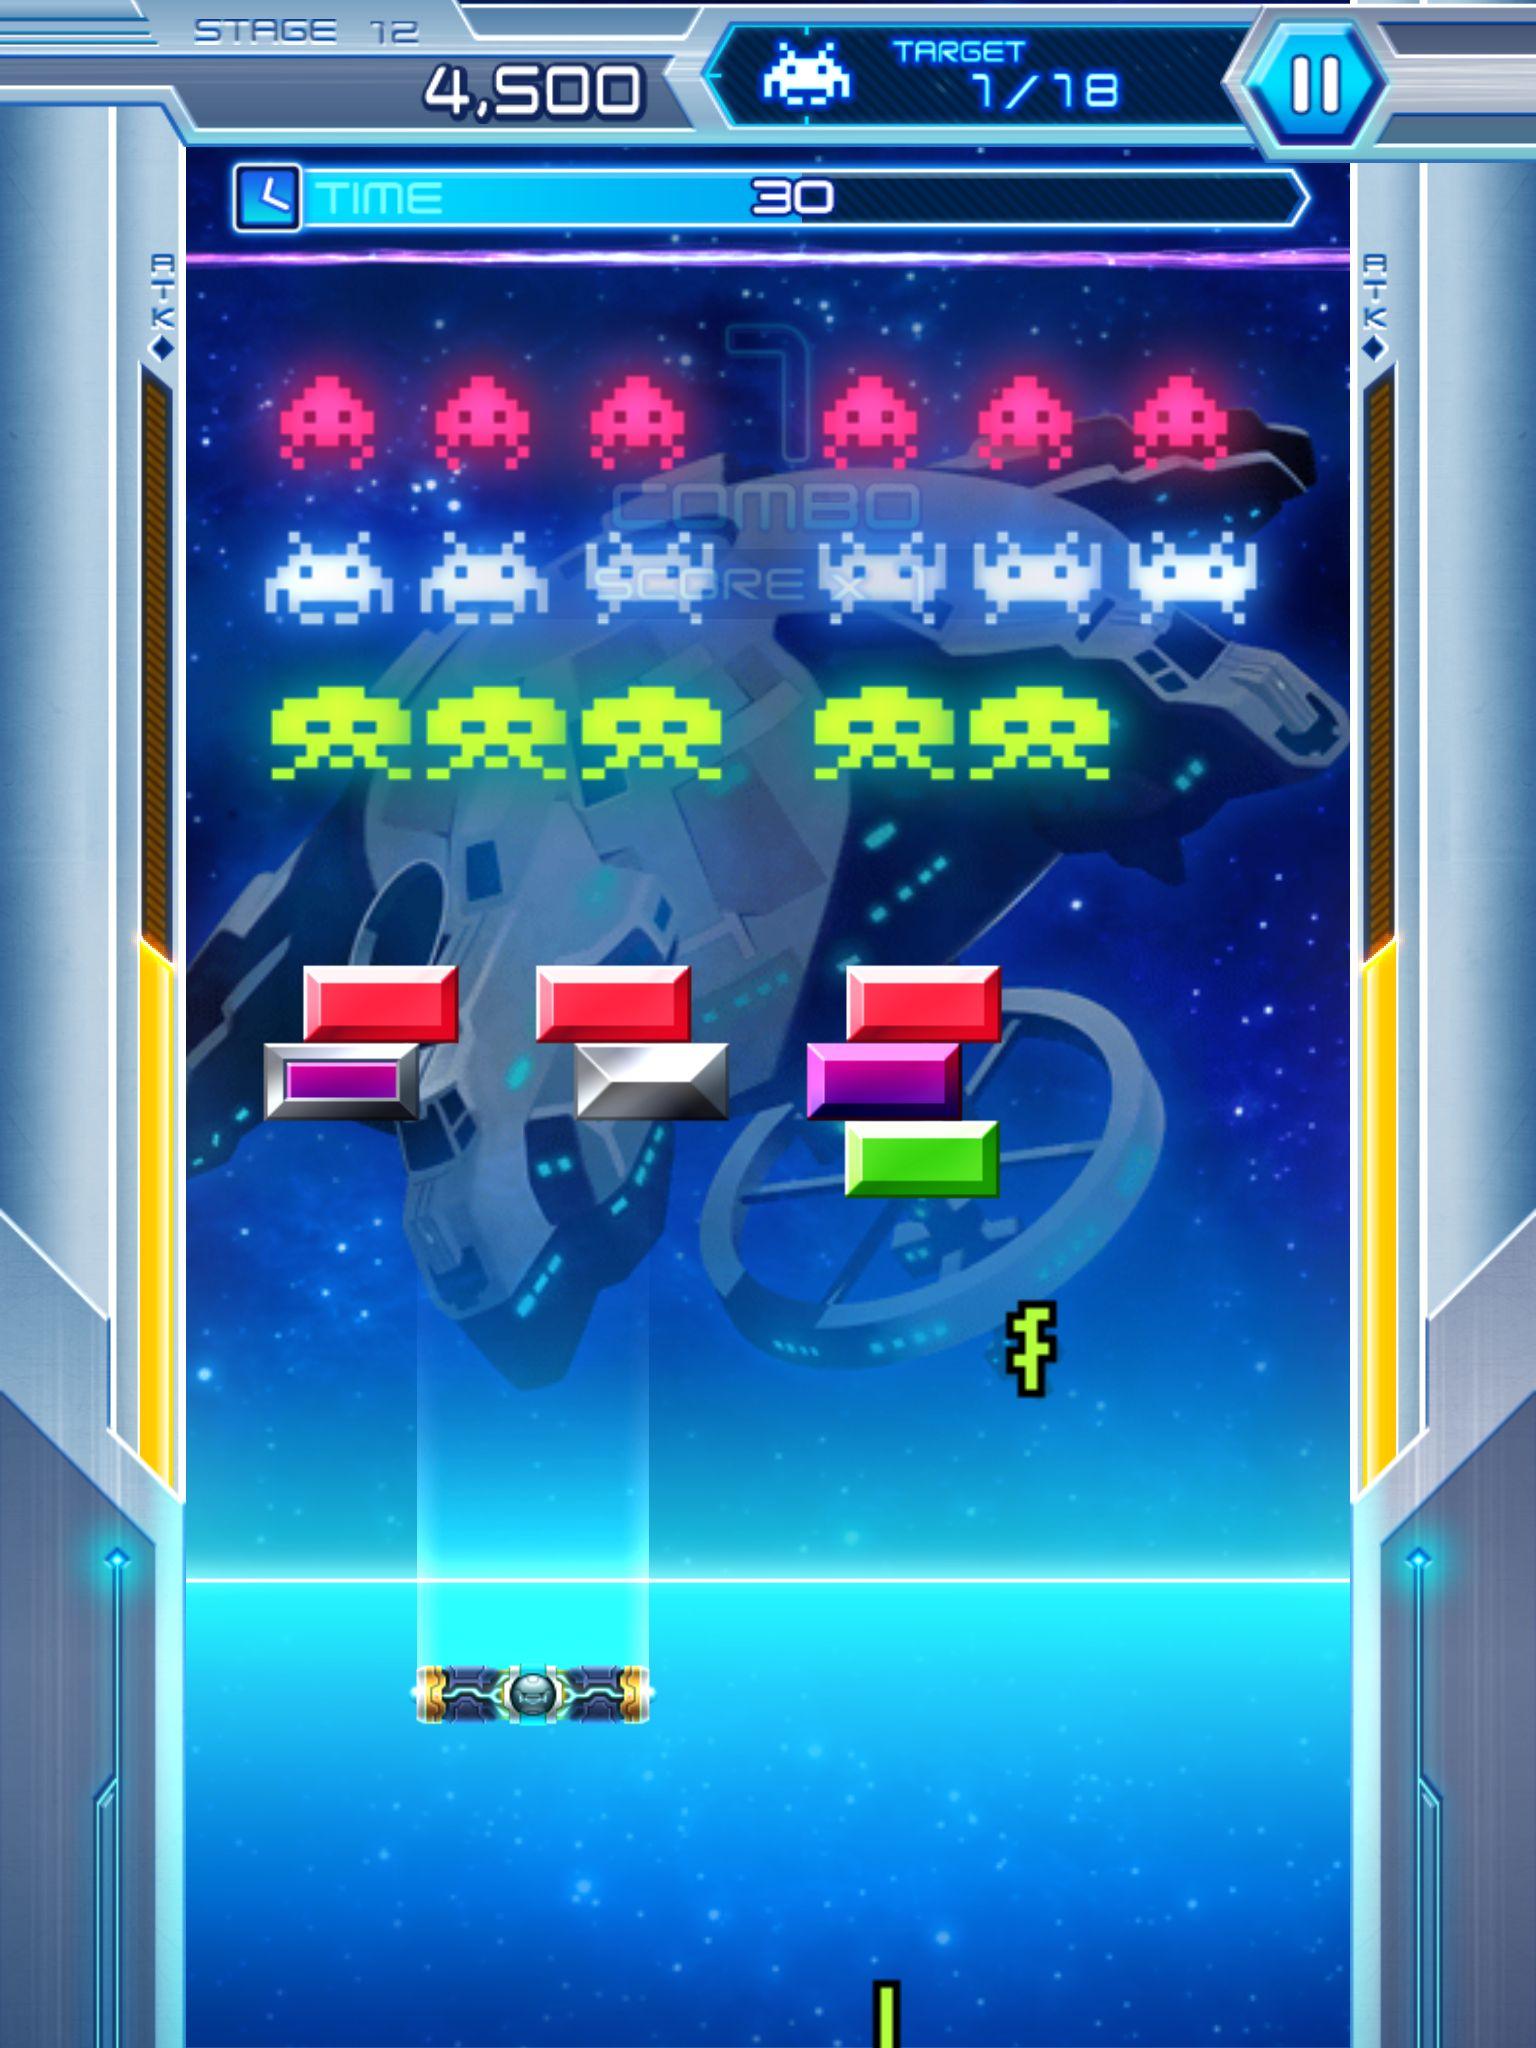 Arkanoid vs Space Invaders